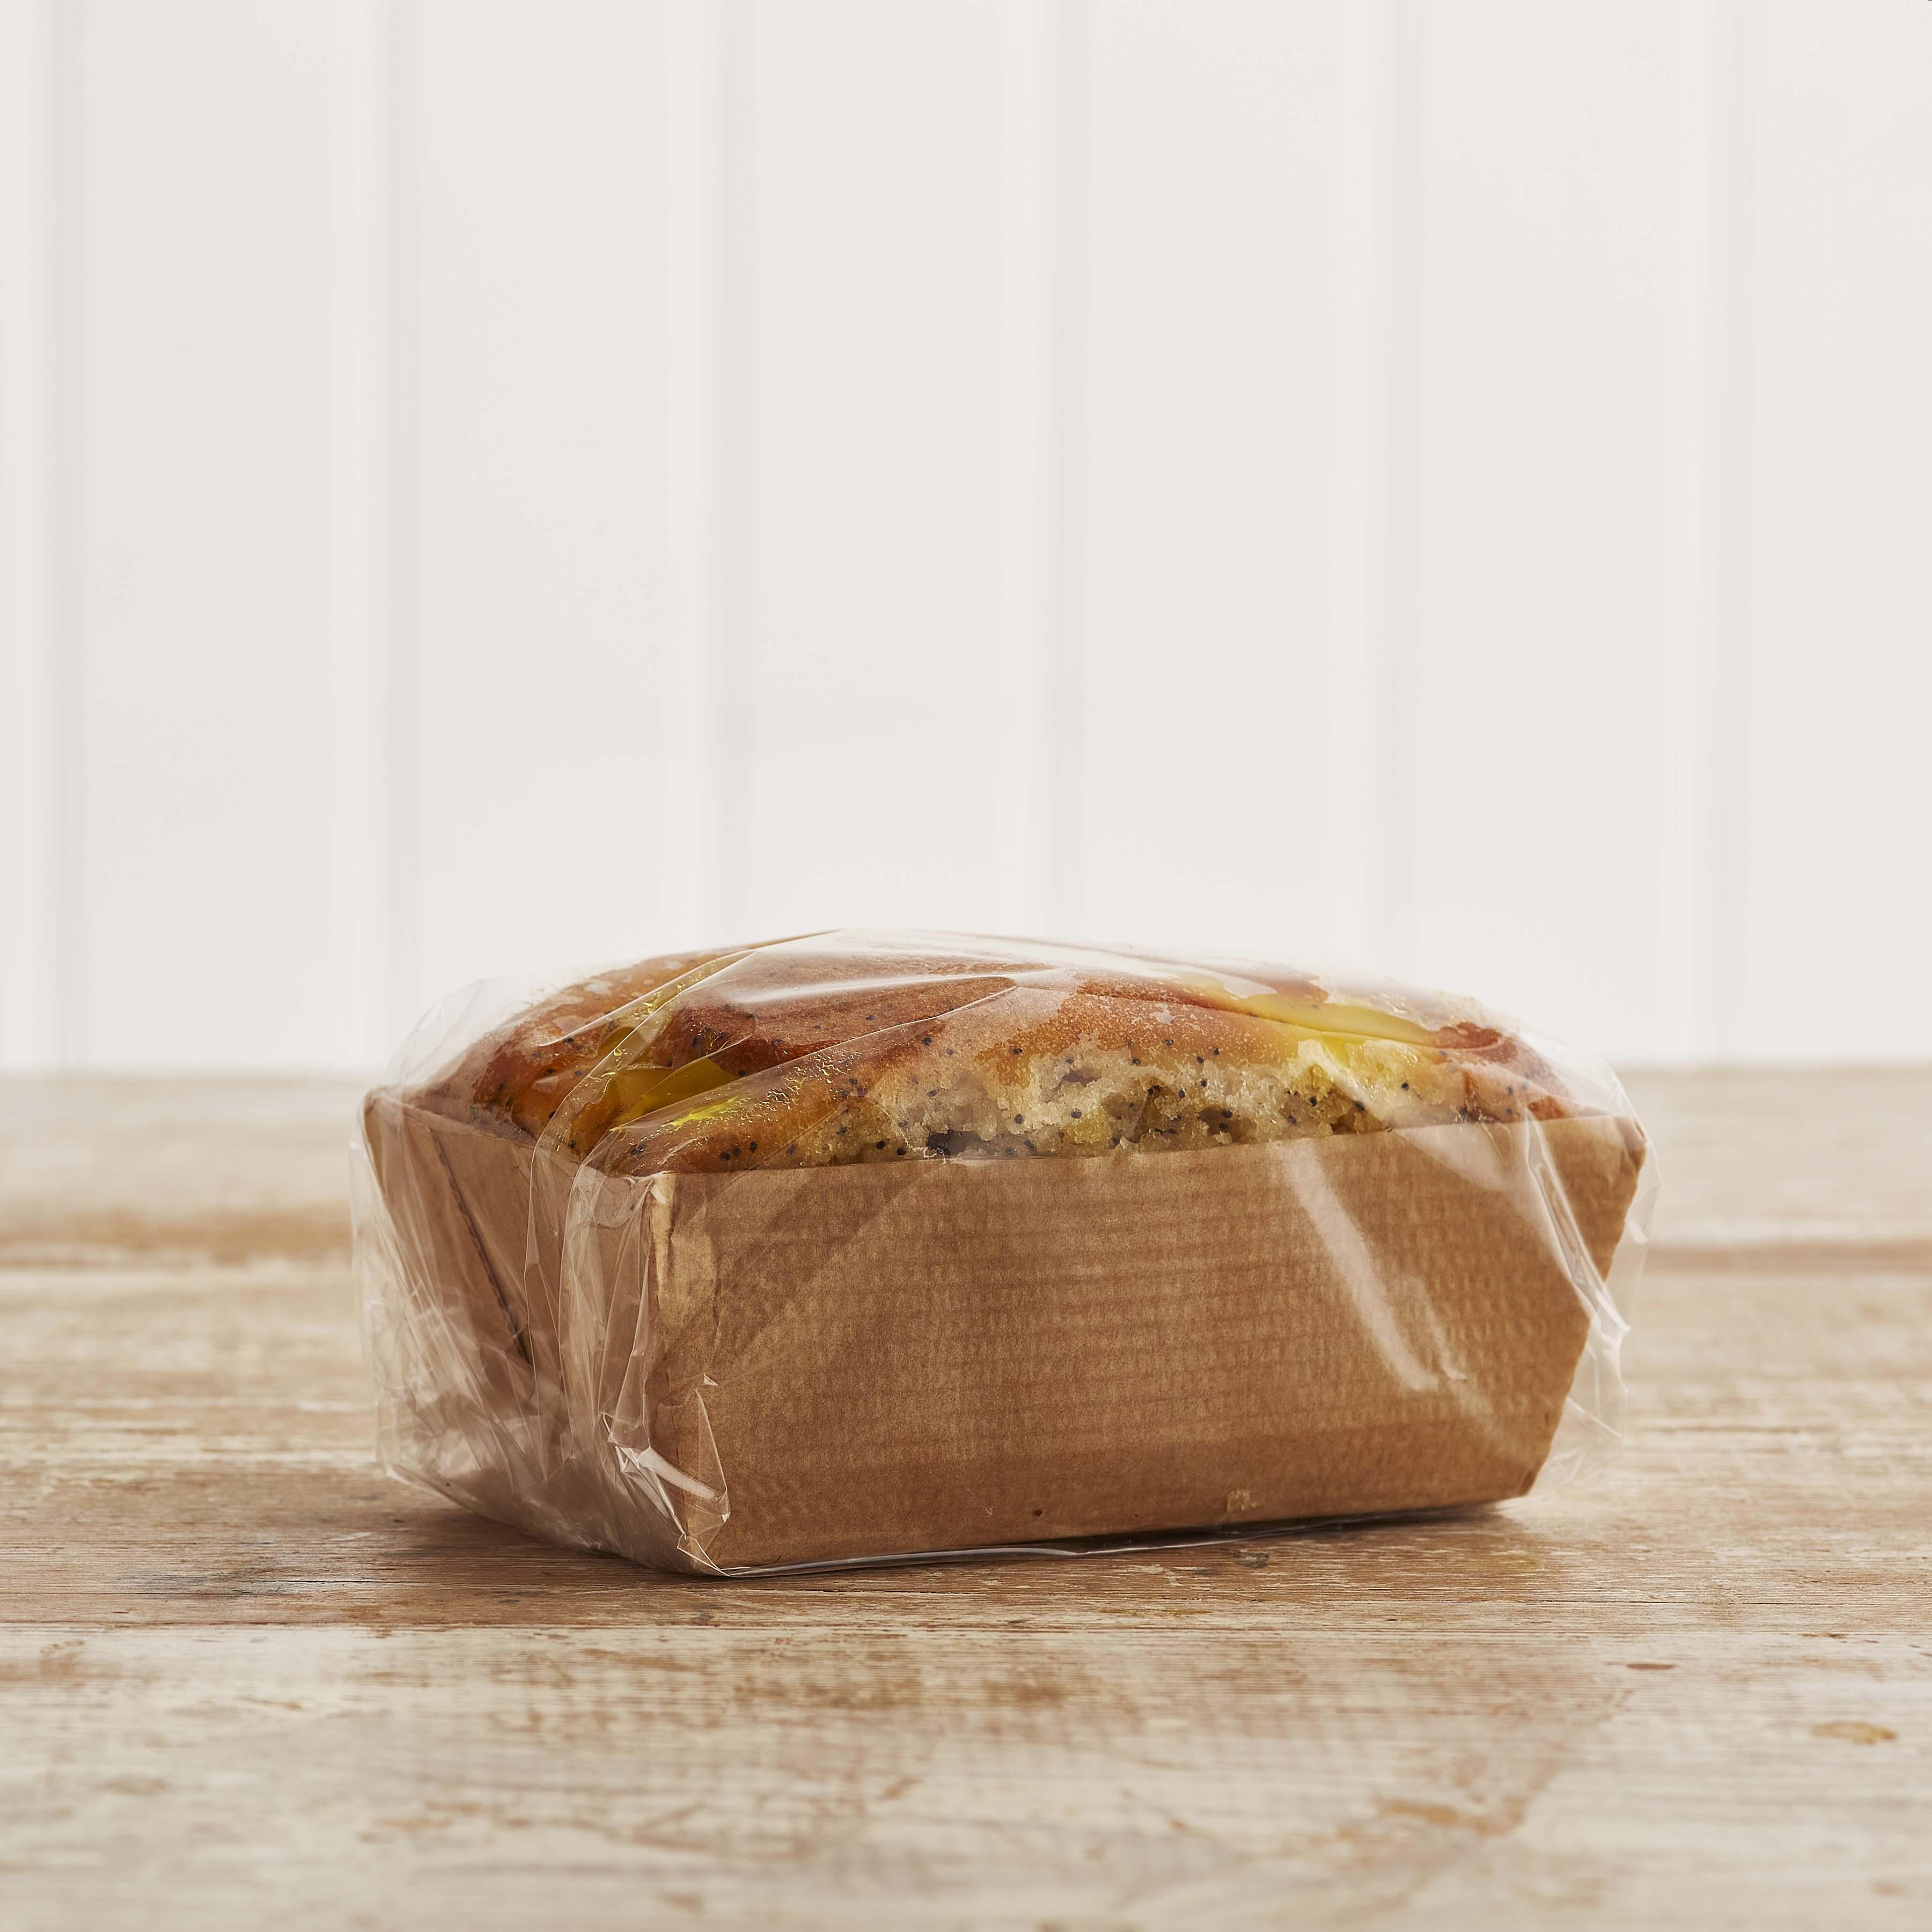 The Original Cake Company Lemon and Poppy Seed Sponge, 250g